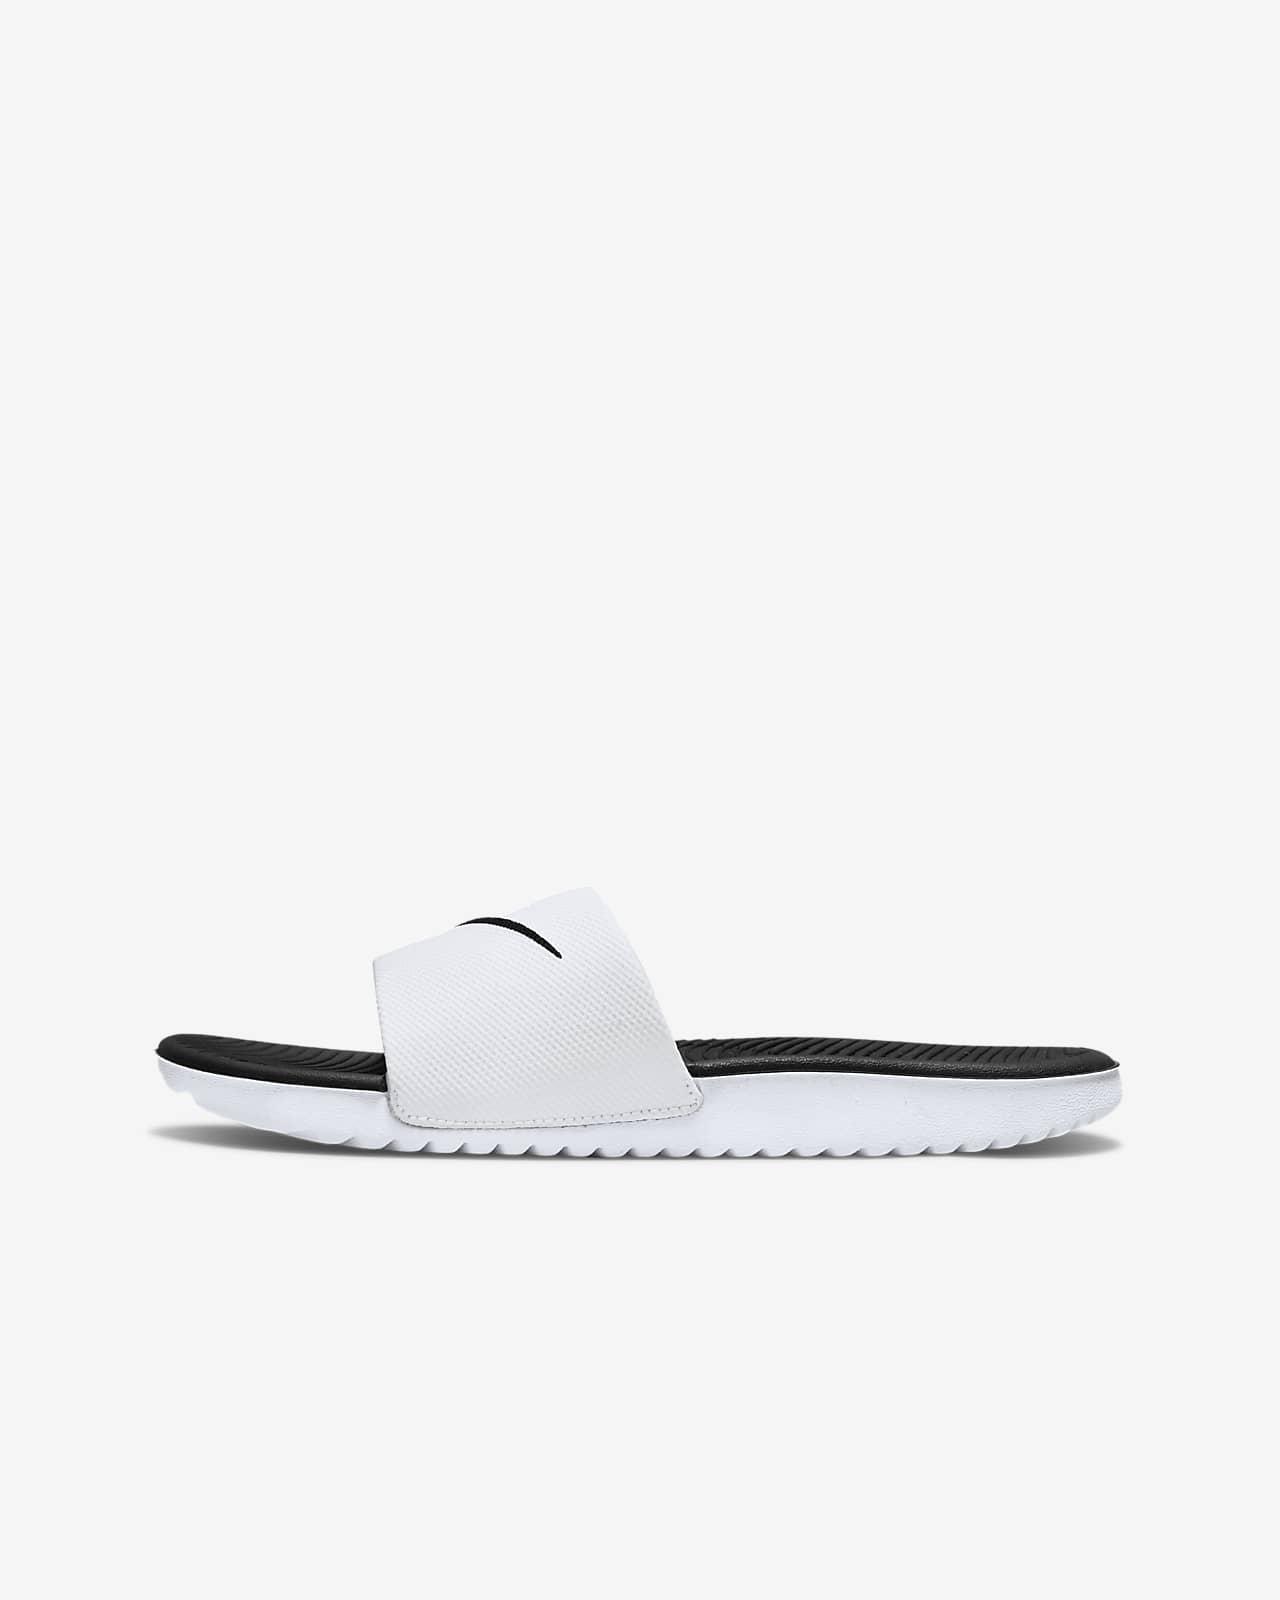 Nike Kawa Little/Big Kids' Slides